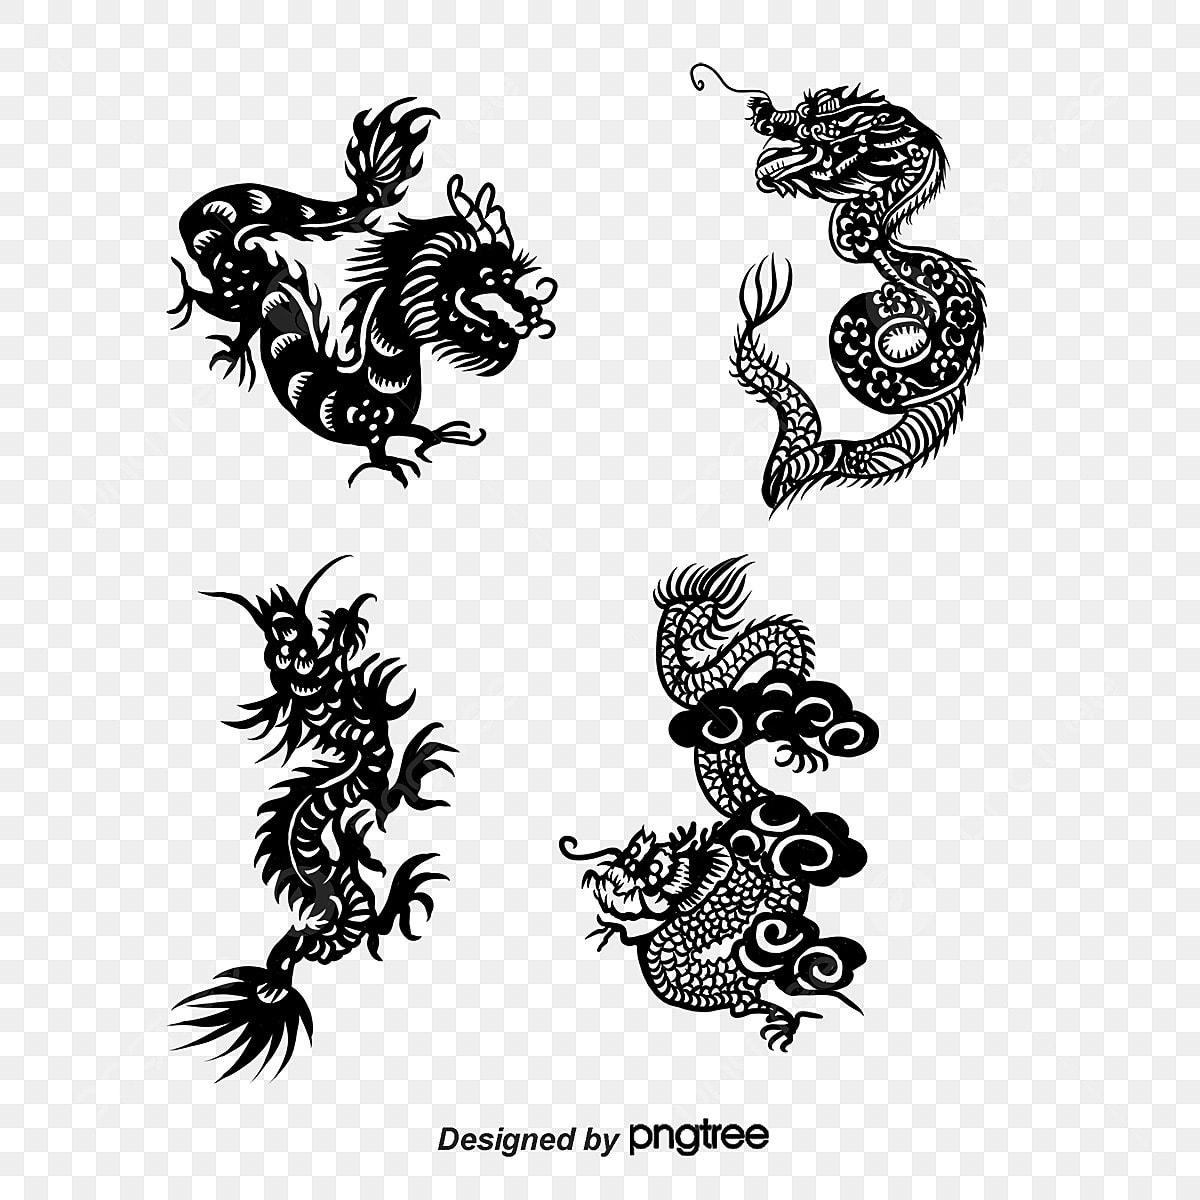 Cabezas De Dragones Para Tatuar vector dragon, tattoo, dragon, creative png y vector para